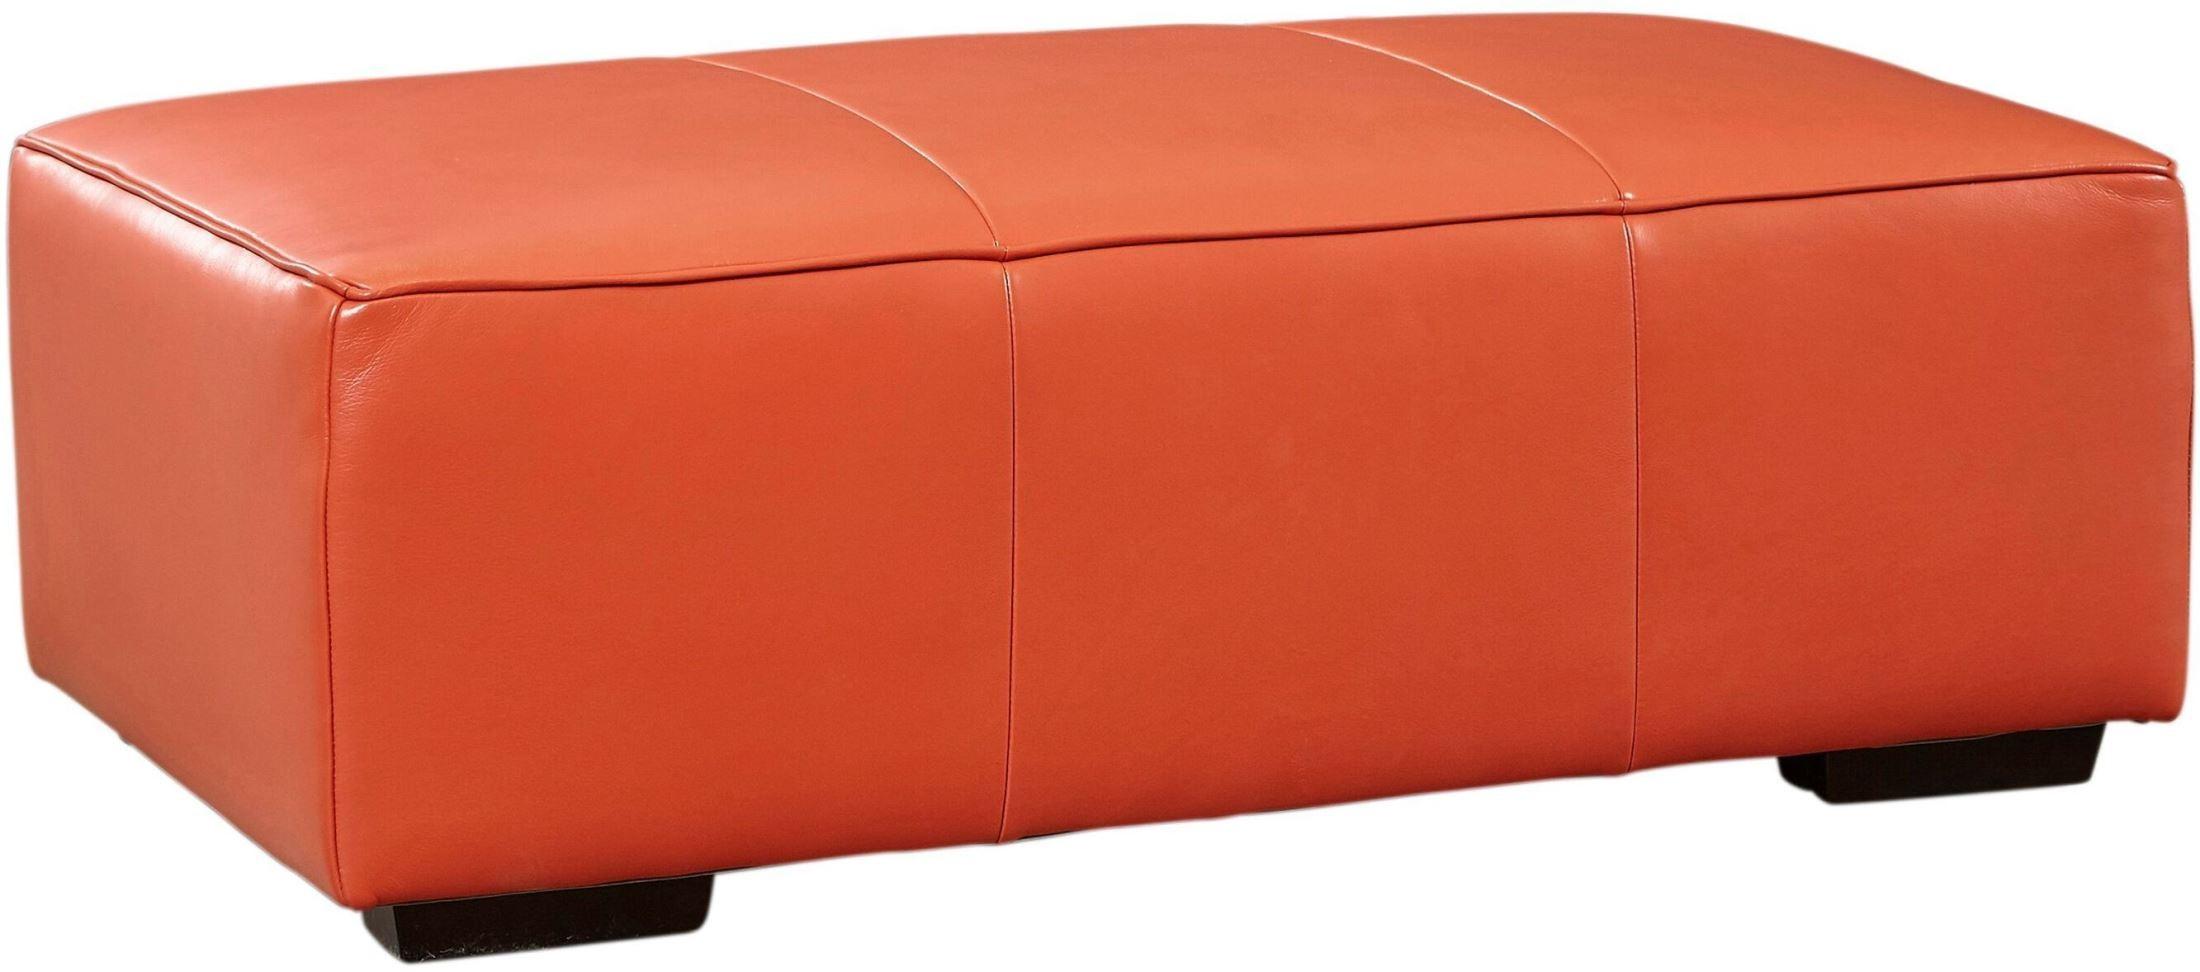 Hayden Tangerine Top Grain Leather Bench Ottoman From Lazzaro Coleman Furniture